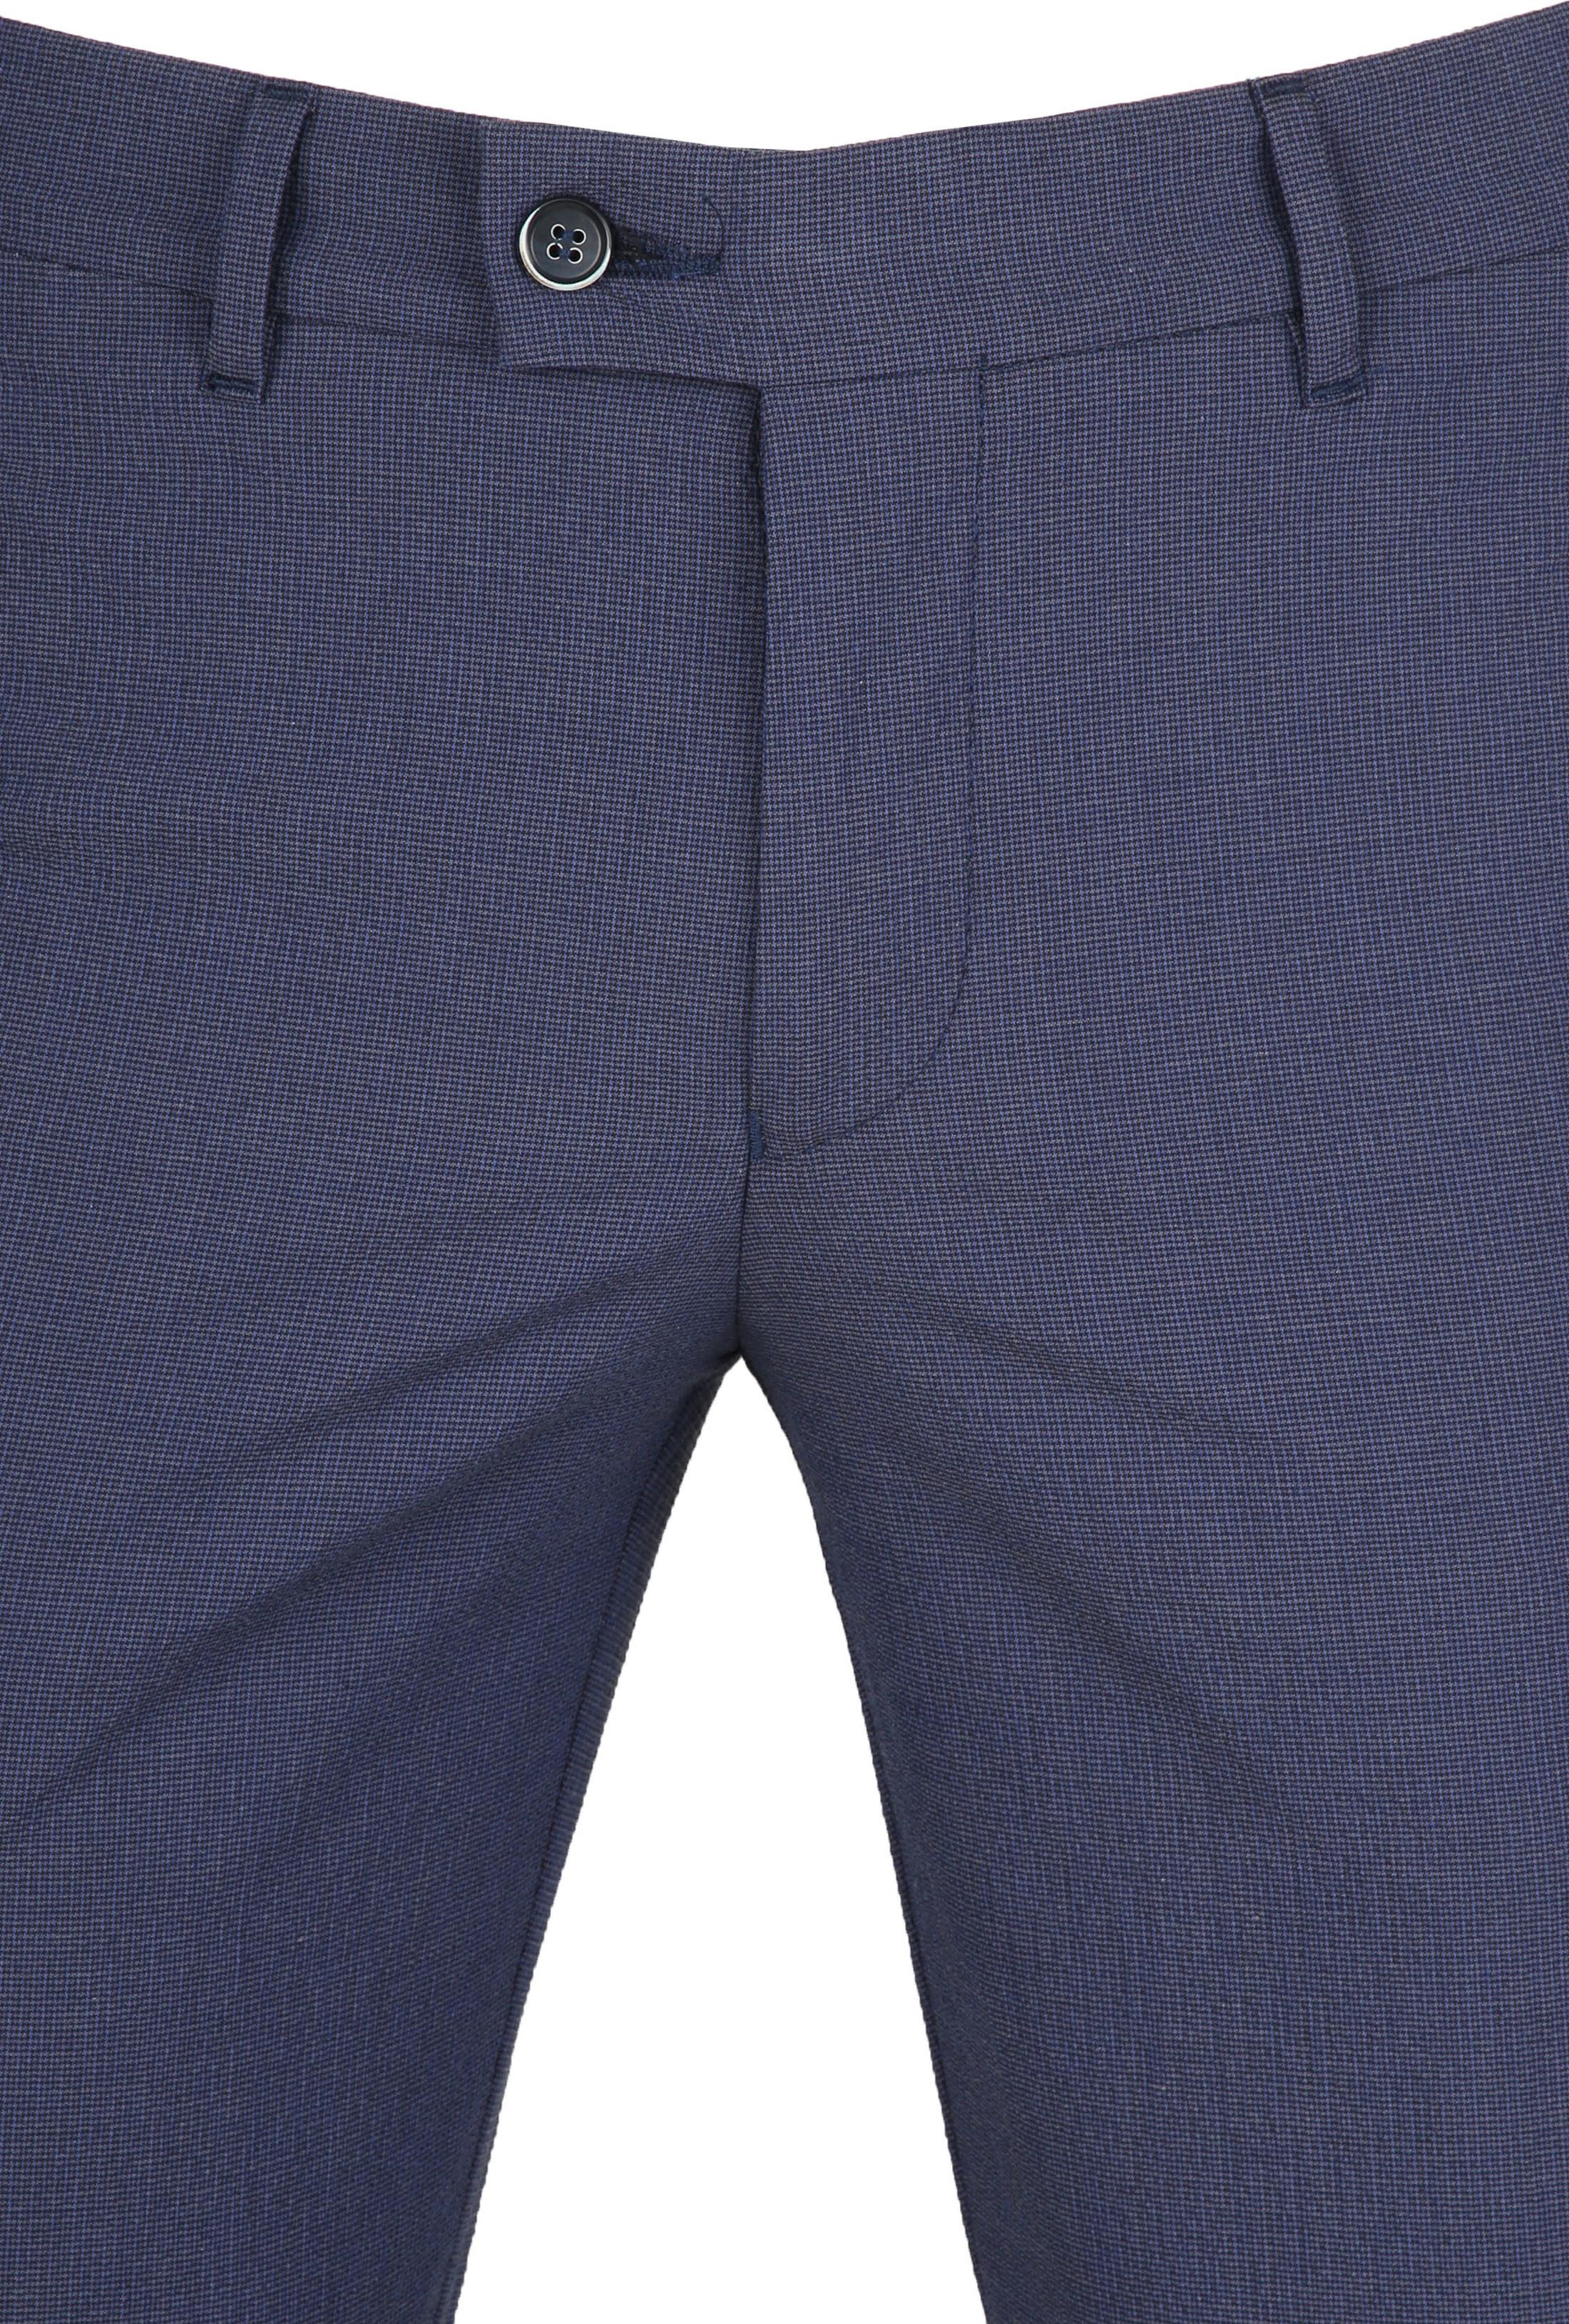 Suitable Pantalon Pisa Dessin Blauw foto 2